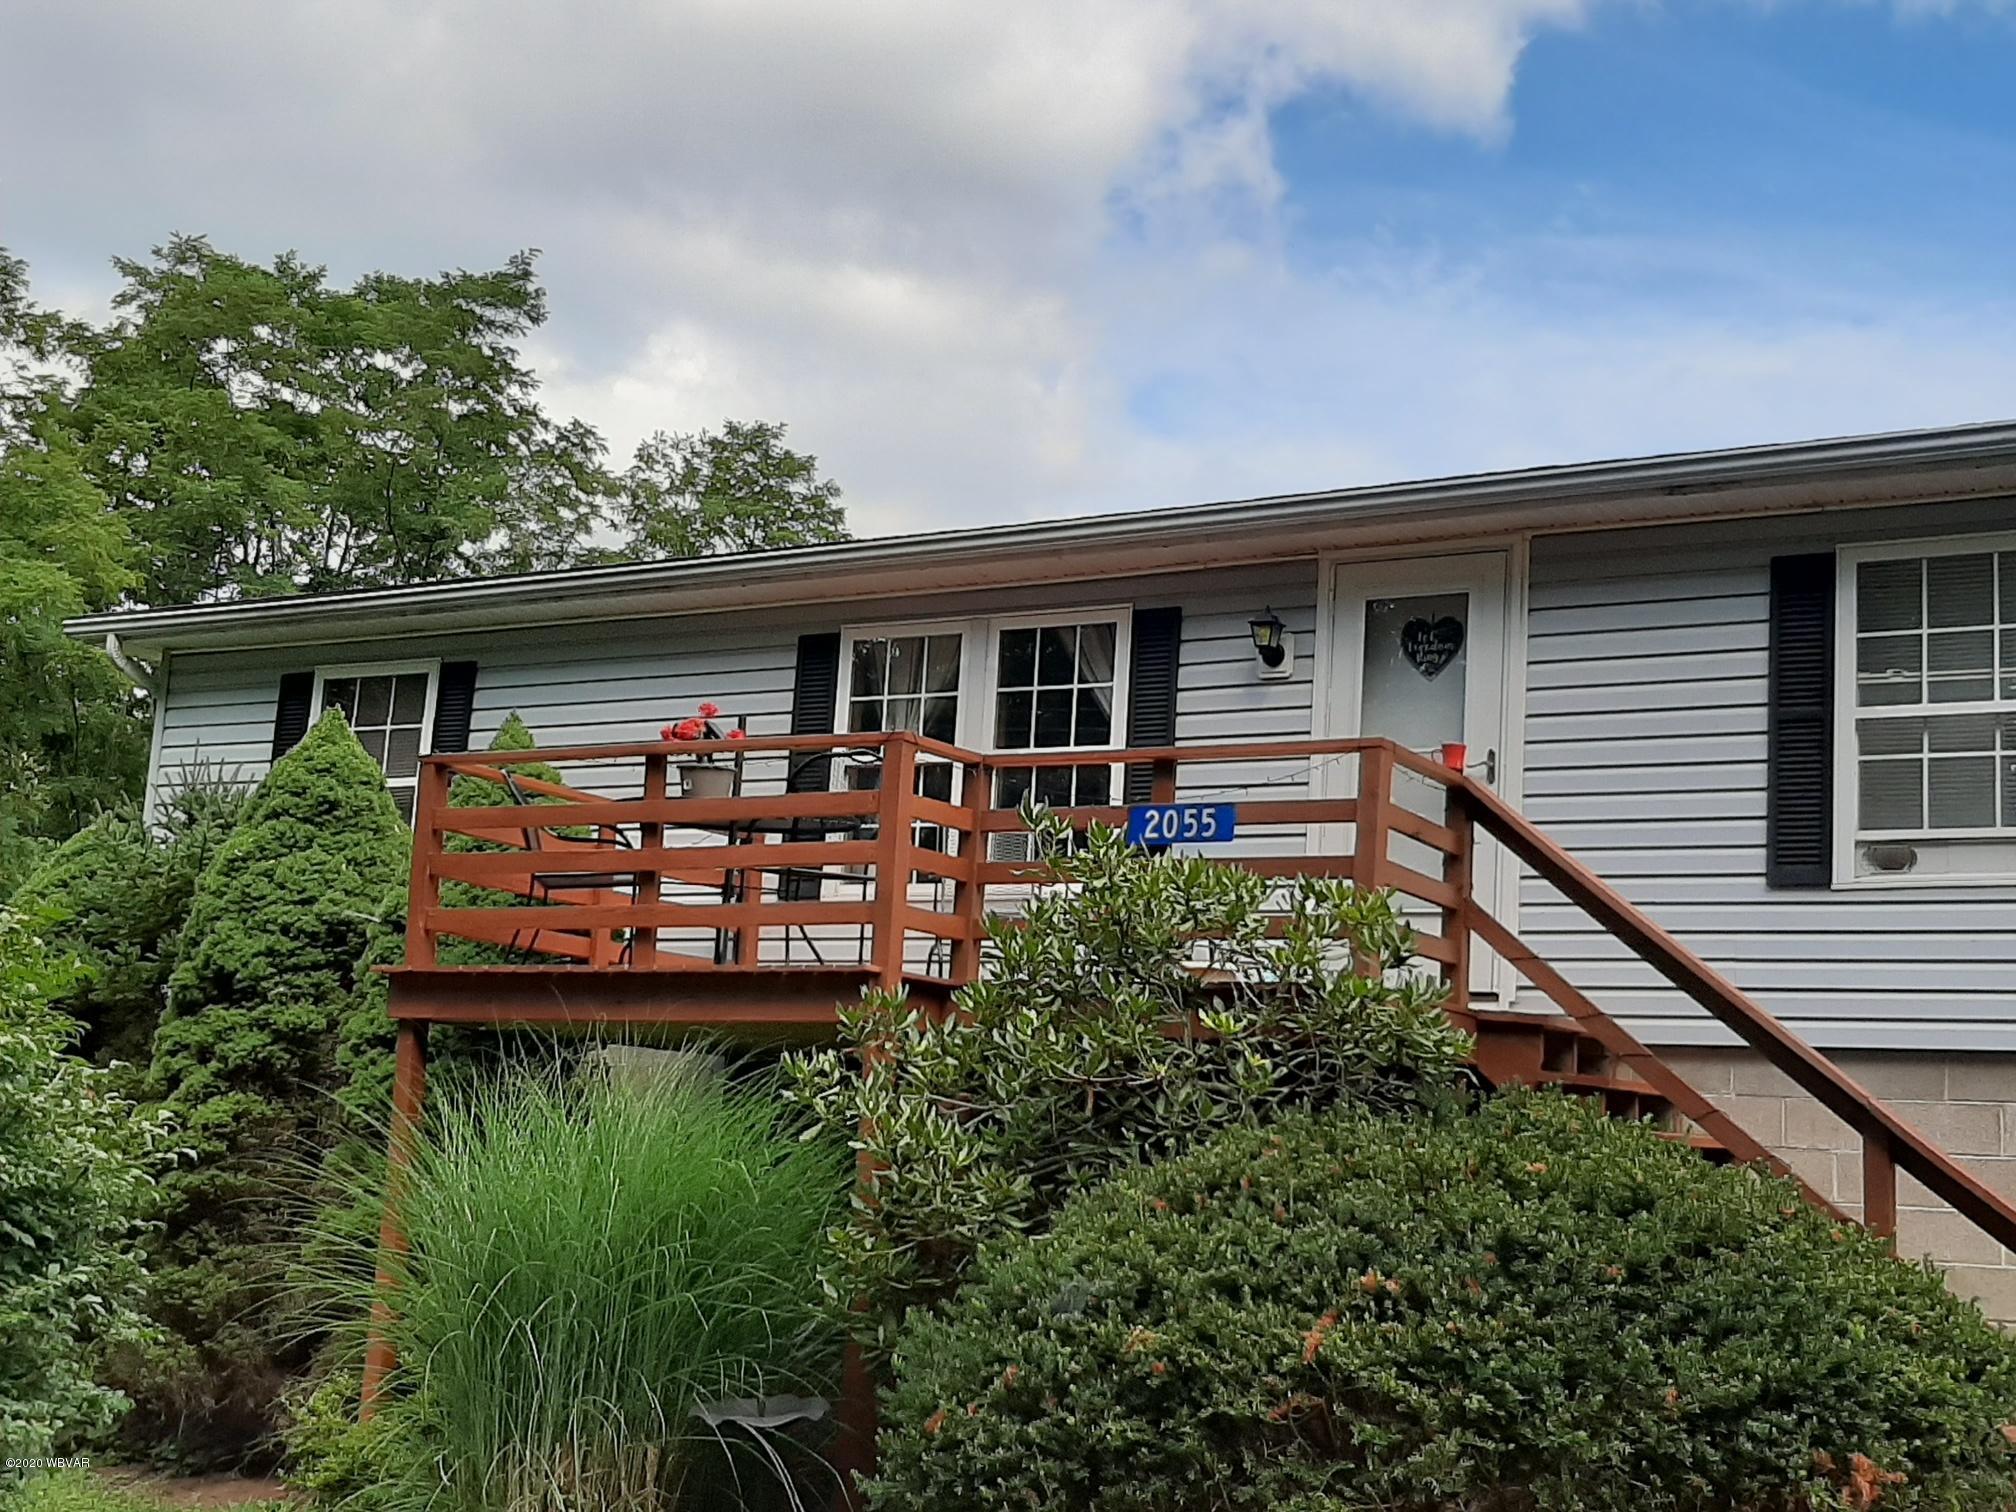 2055 ISLAND ROAD, Lock Haven, PA 17745, 3 Bedrooms Bedrooms, ,3 BathroomsBathrooms,Residential,For sale,ISLAND,WB-90923